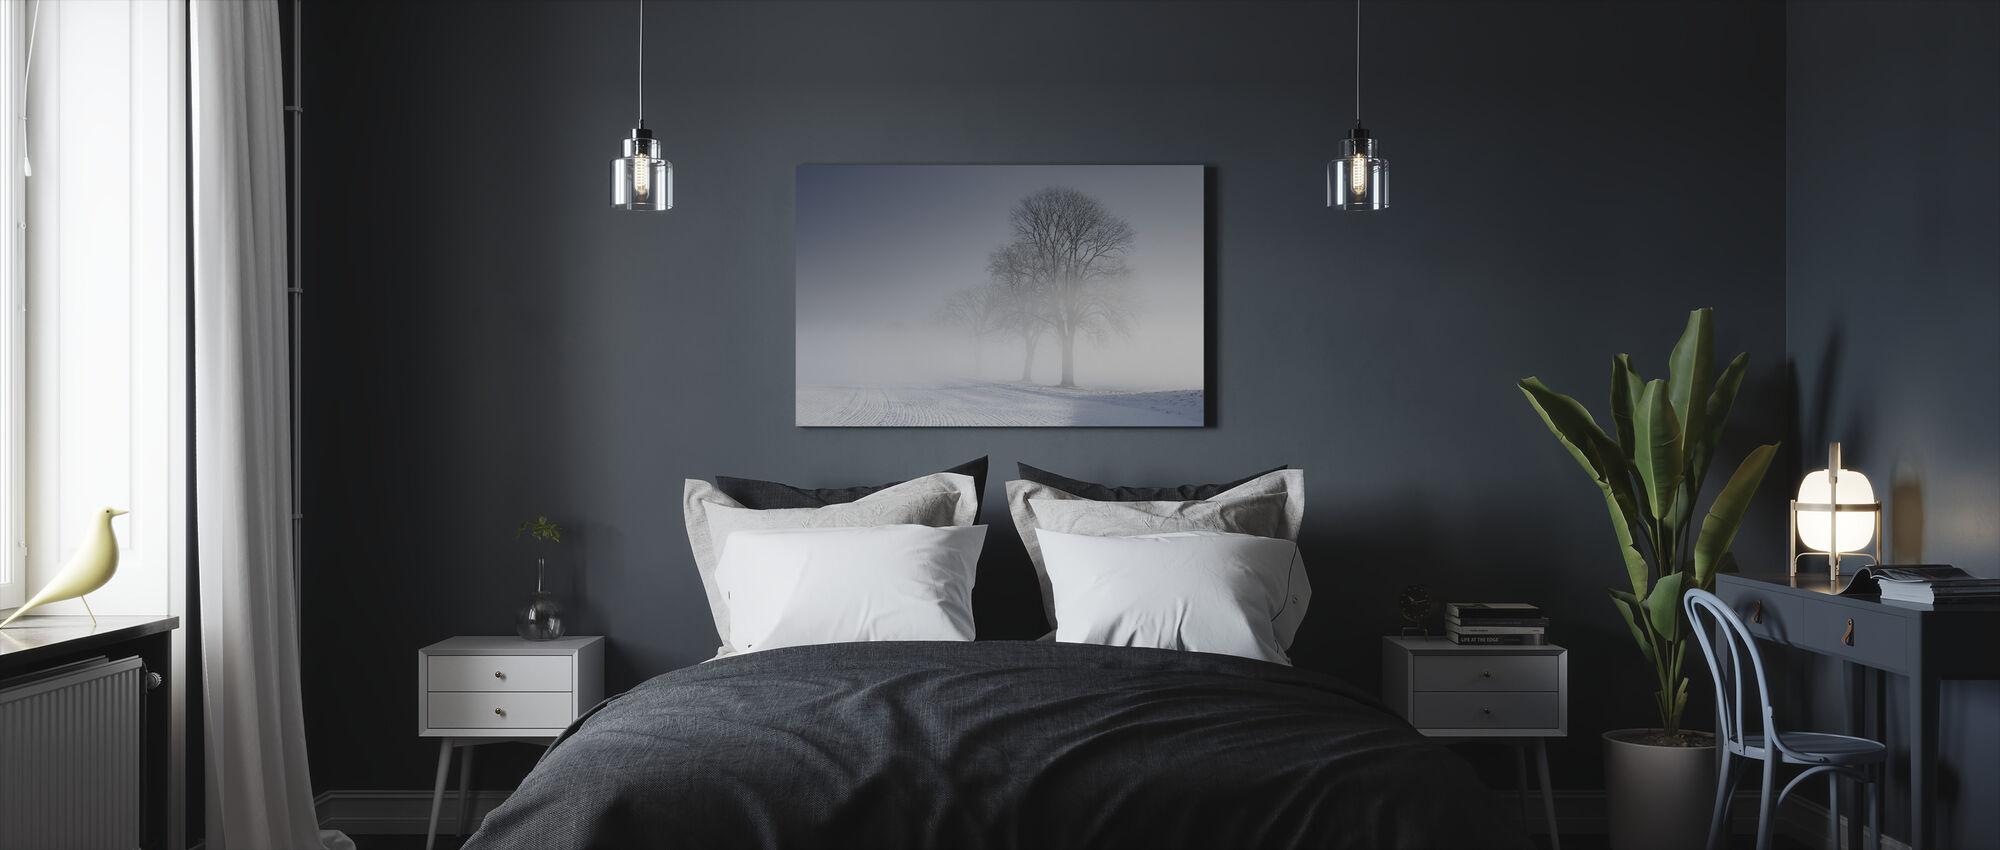 Talvimaisema Skabersjö, Ruotsi - Canvastaulu - Makuuhuone